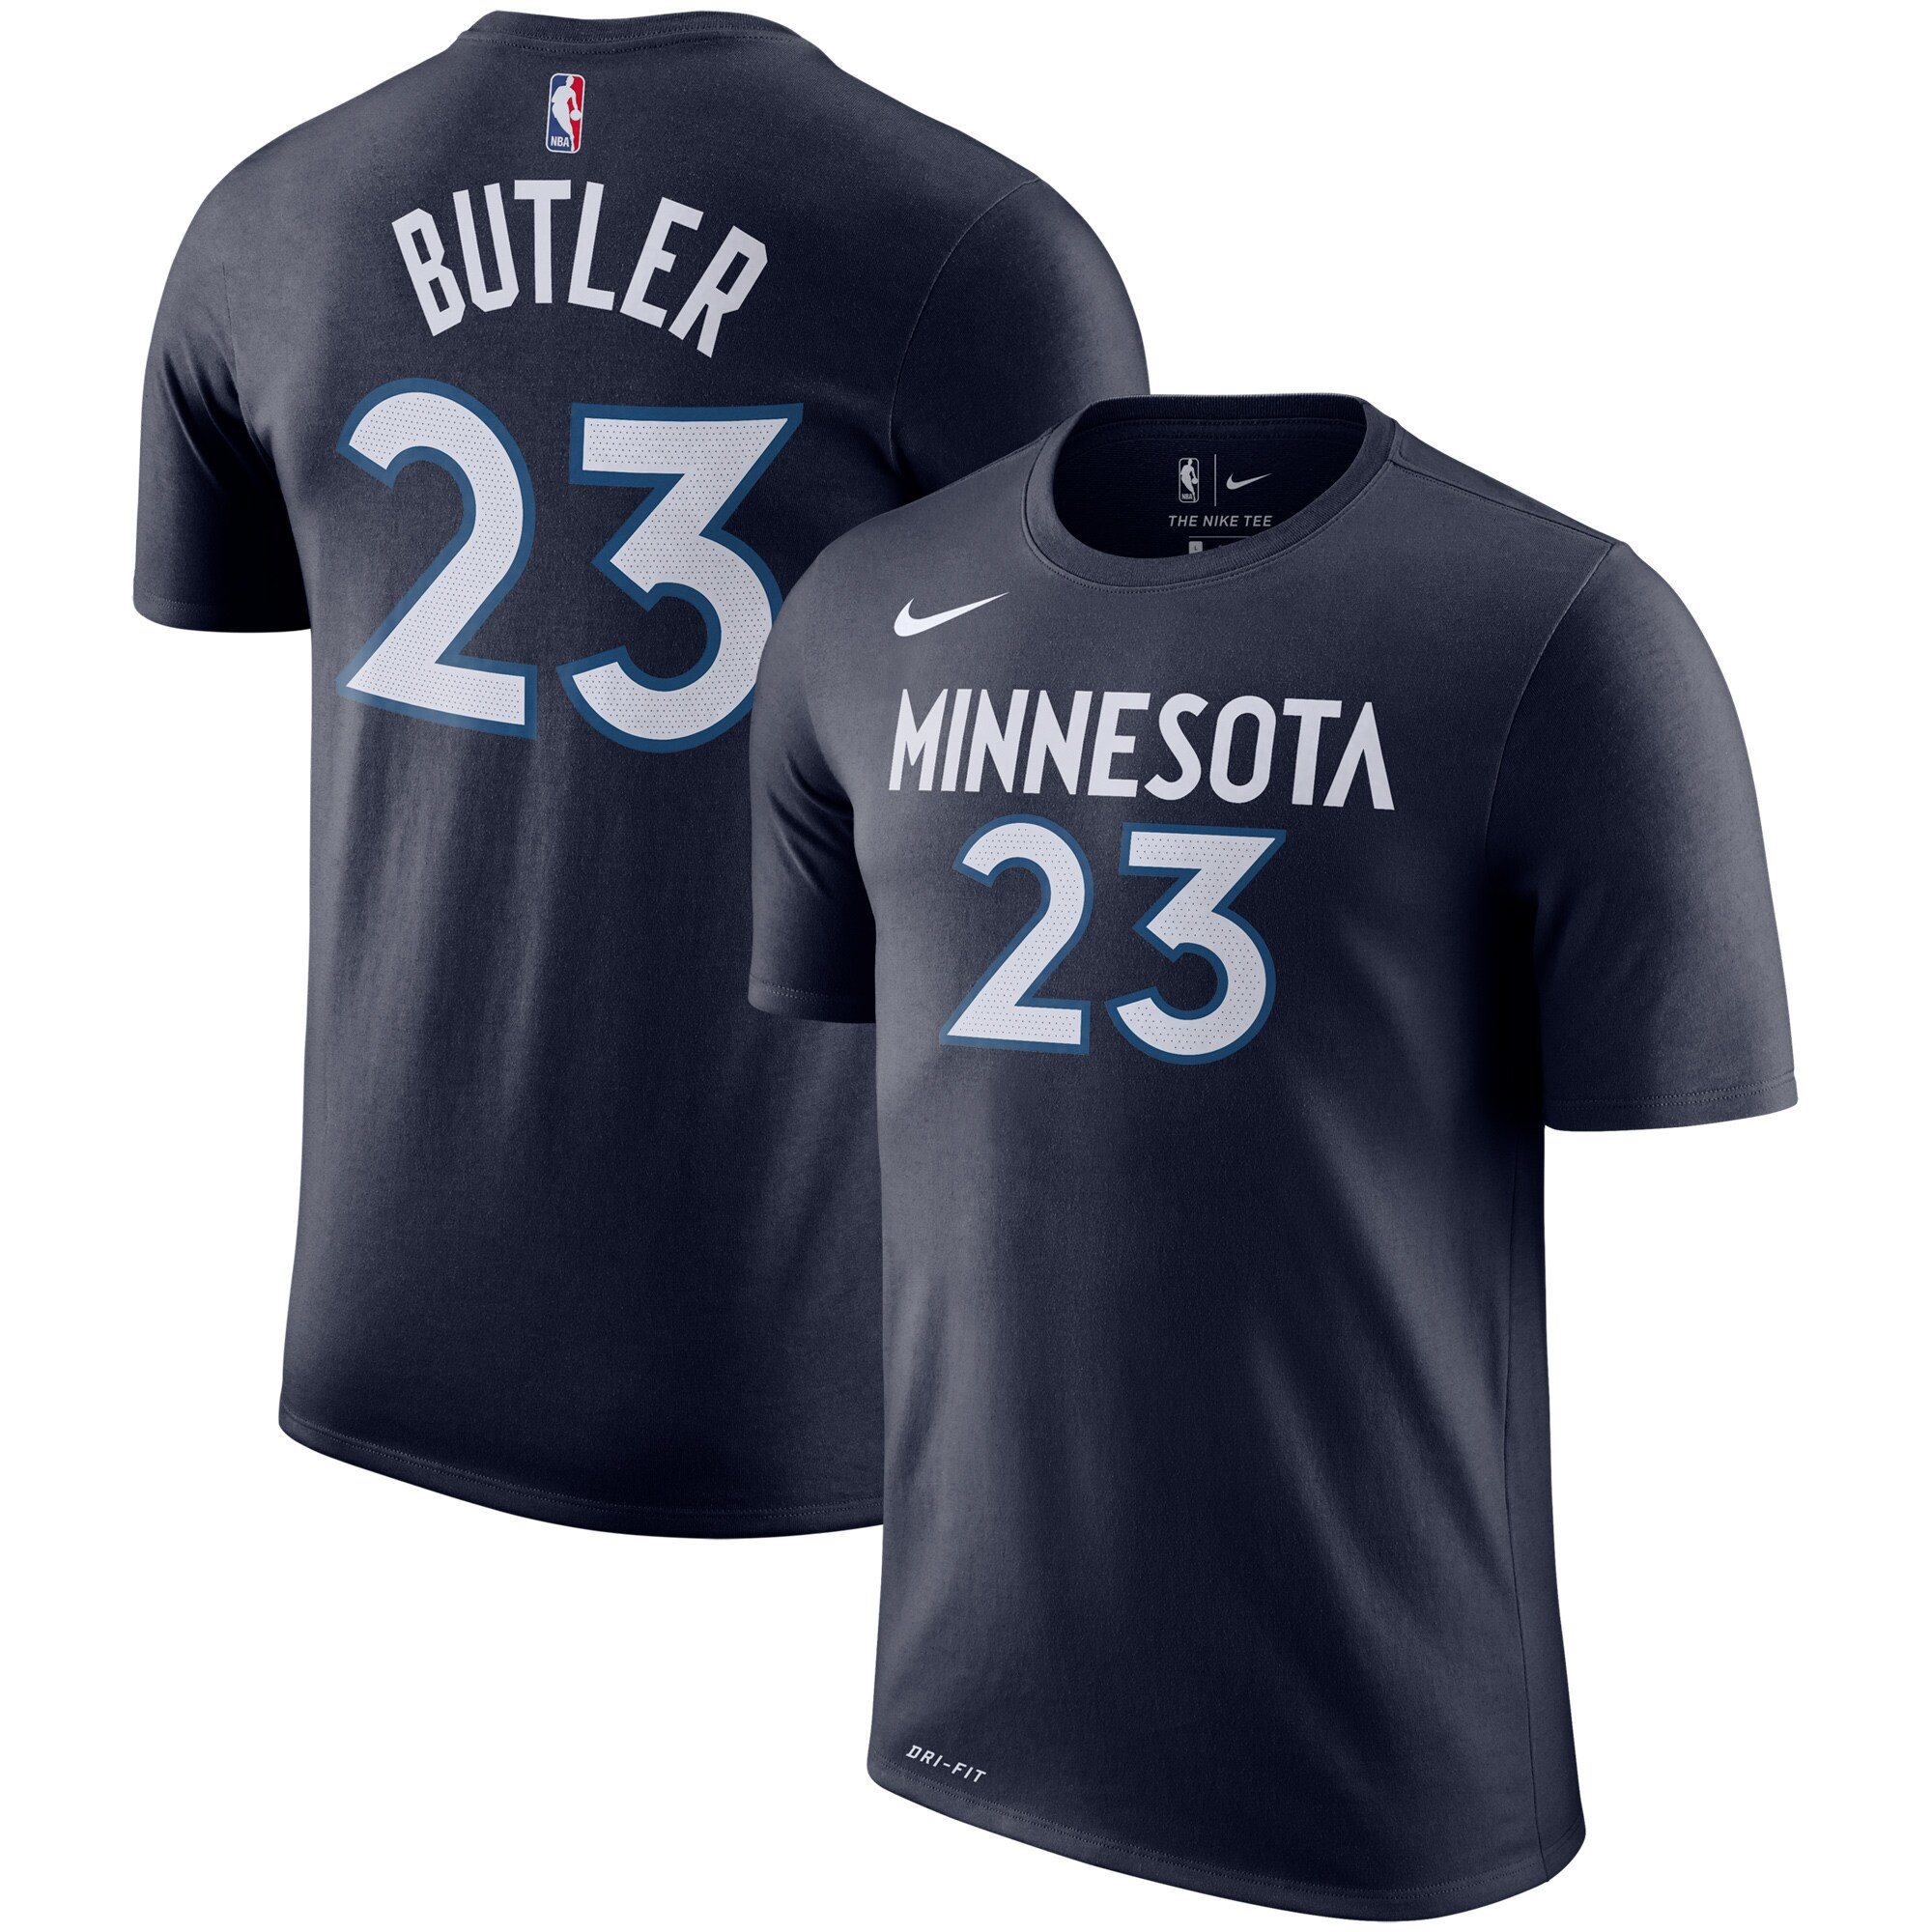 Jimmy Butler Minnesota Timberwolves Nike Name & Number Performance T-Shirt - Navy